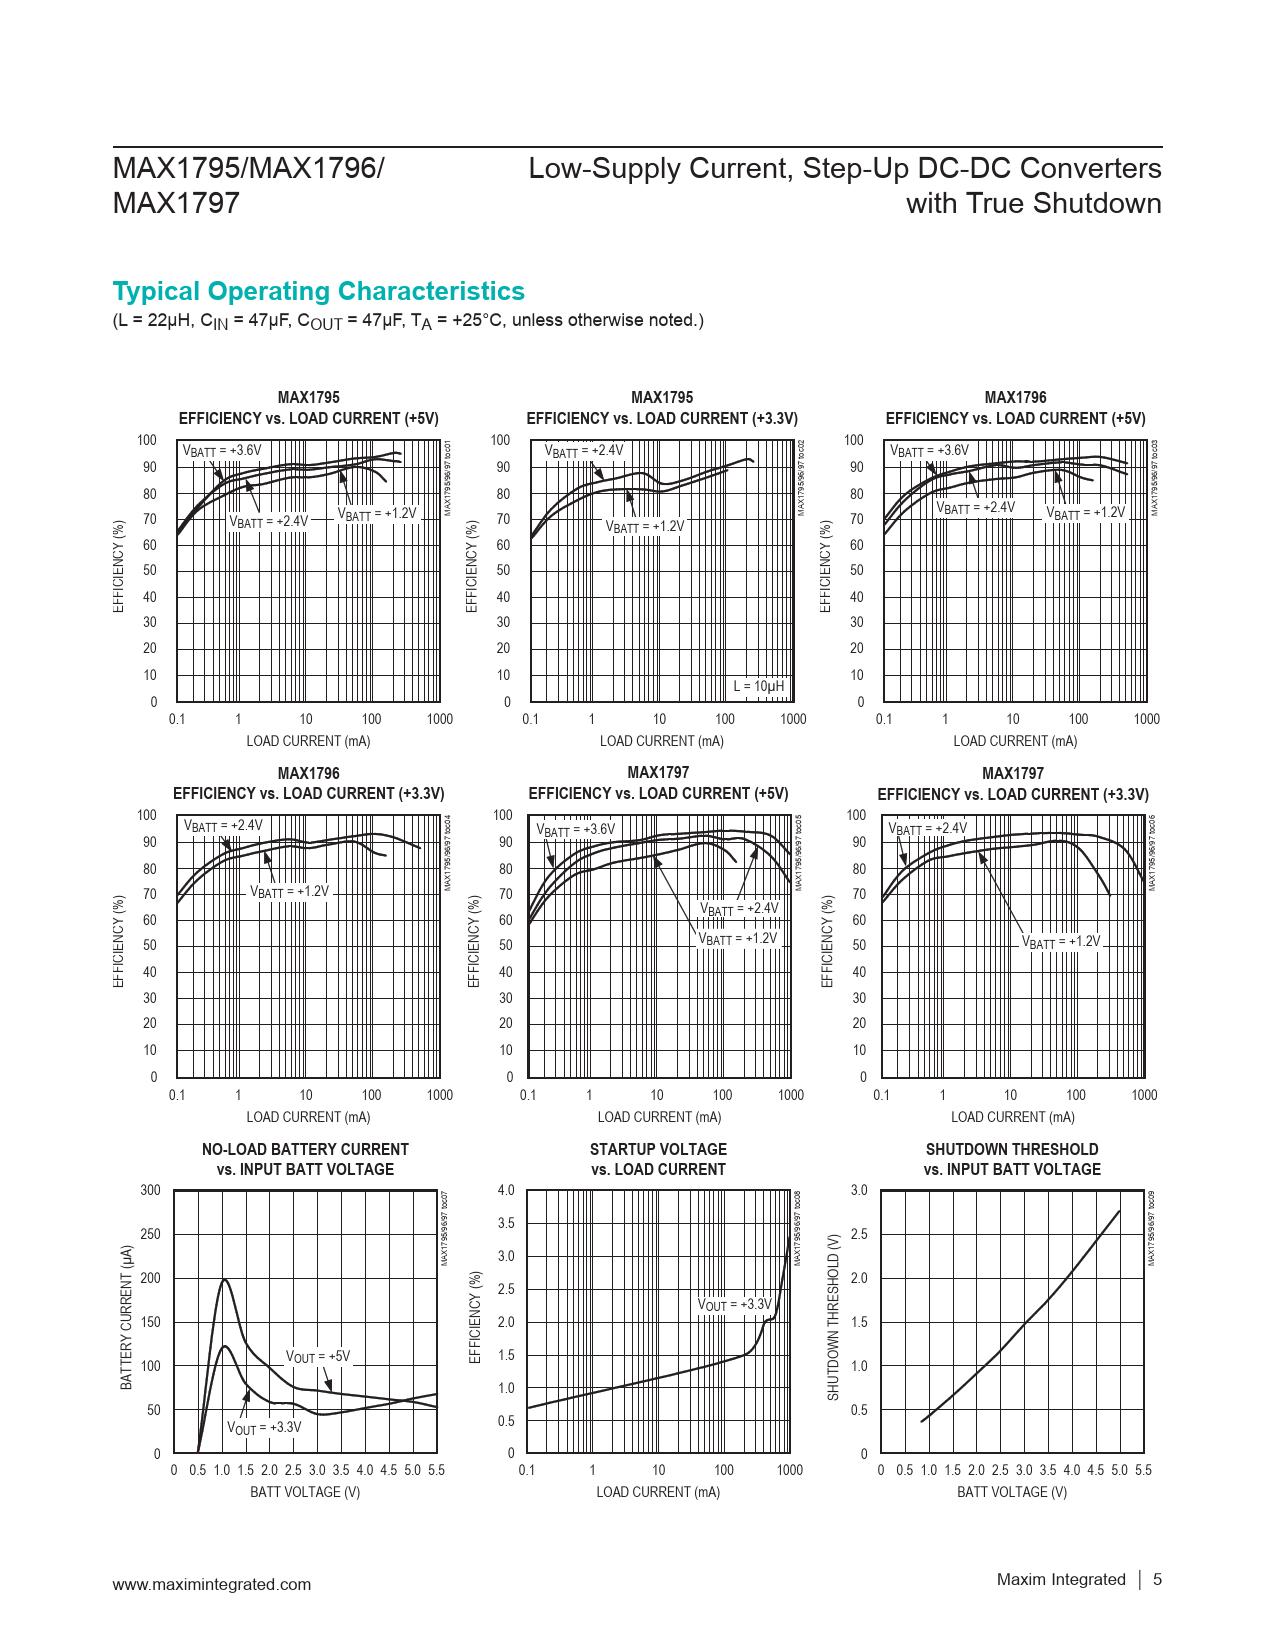 Typical Operating Characteristics MAX1795 MAX1796 EFFICIENCY vs LOAD CURRENT (+5V) EFFICIENCY vs LOAD CURRENT (+3.3V)